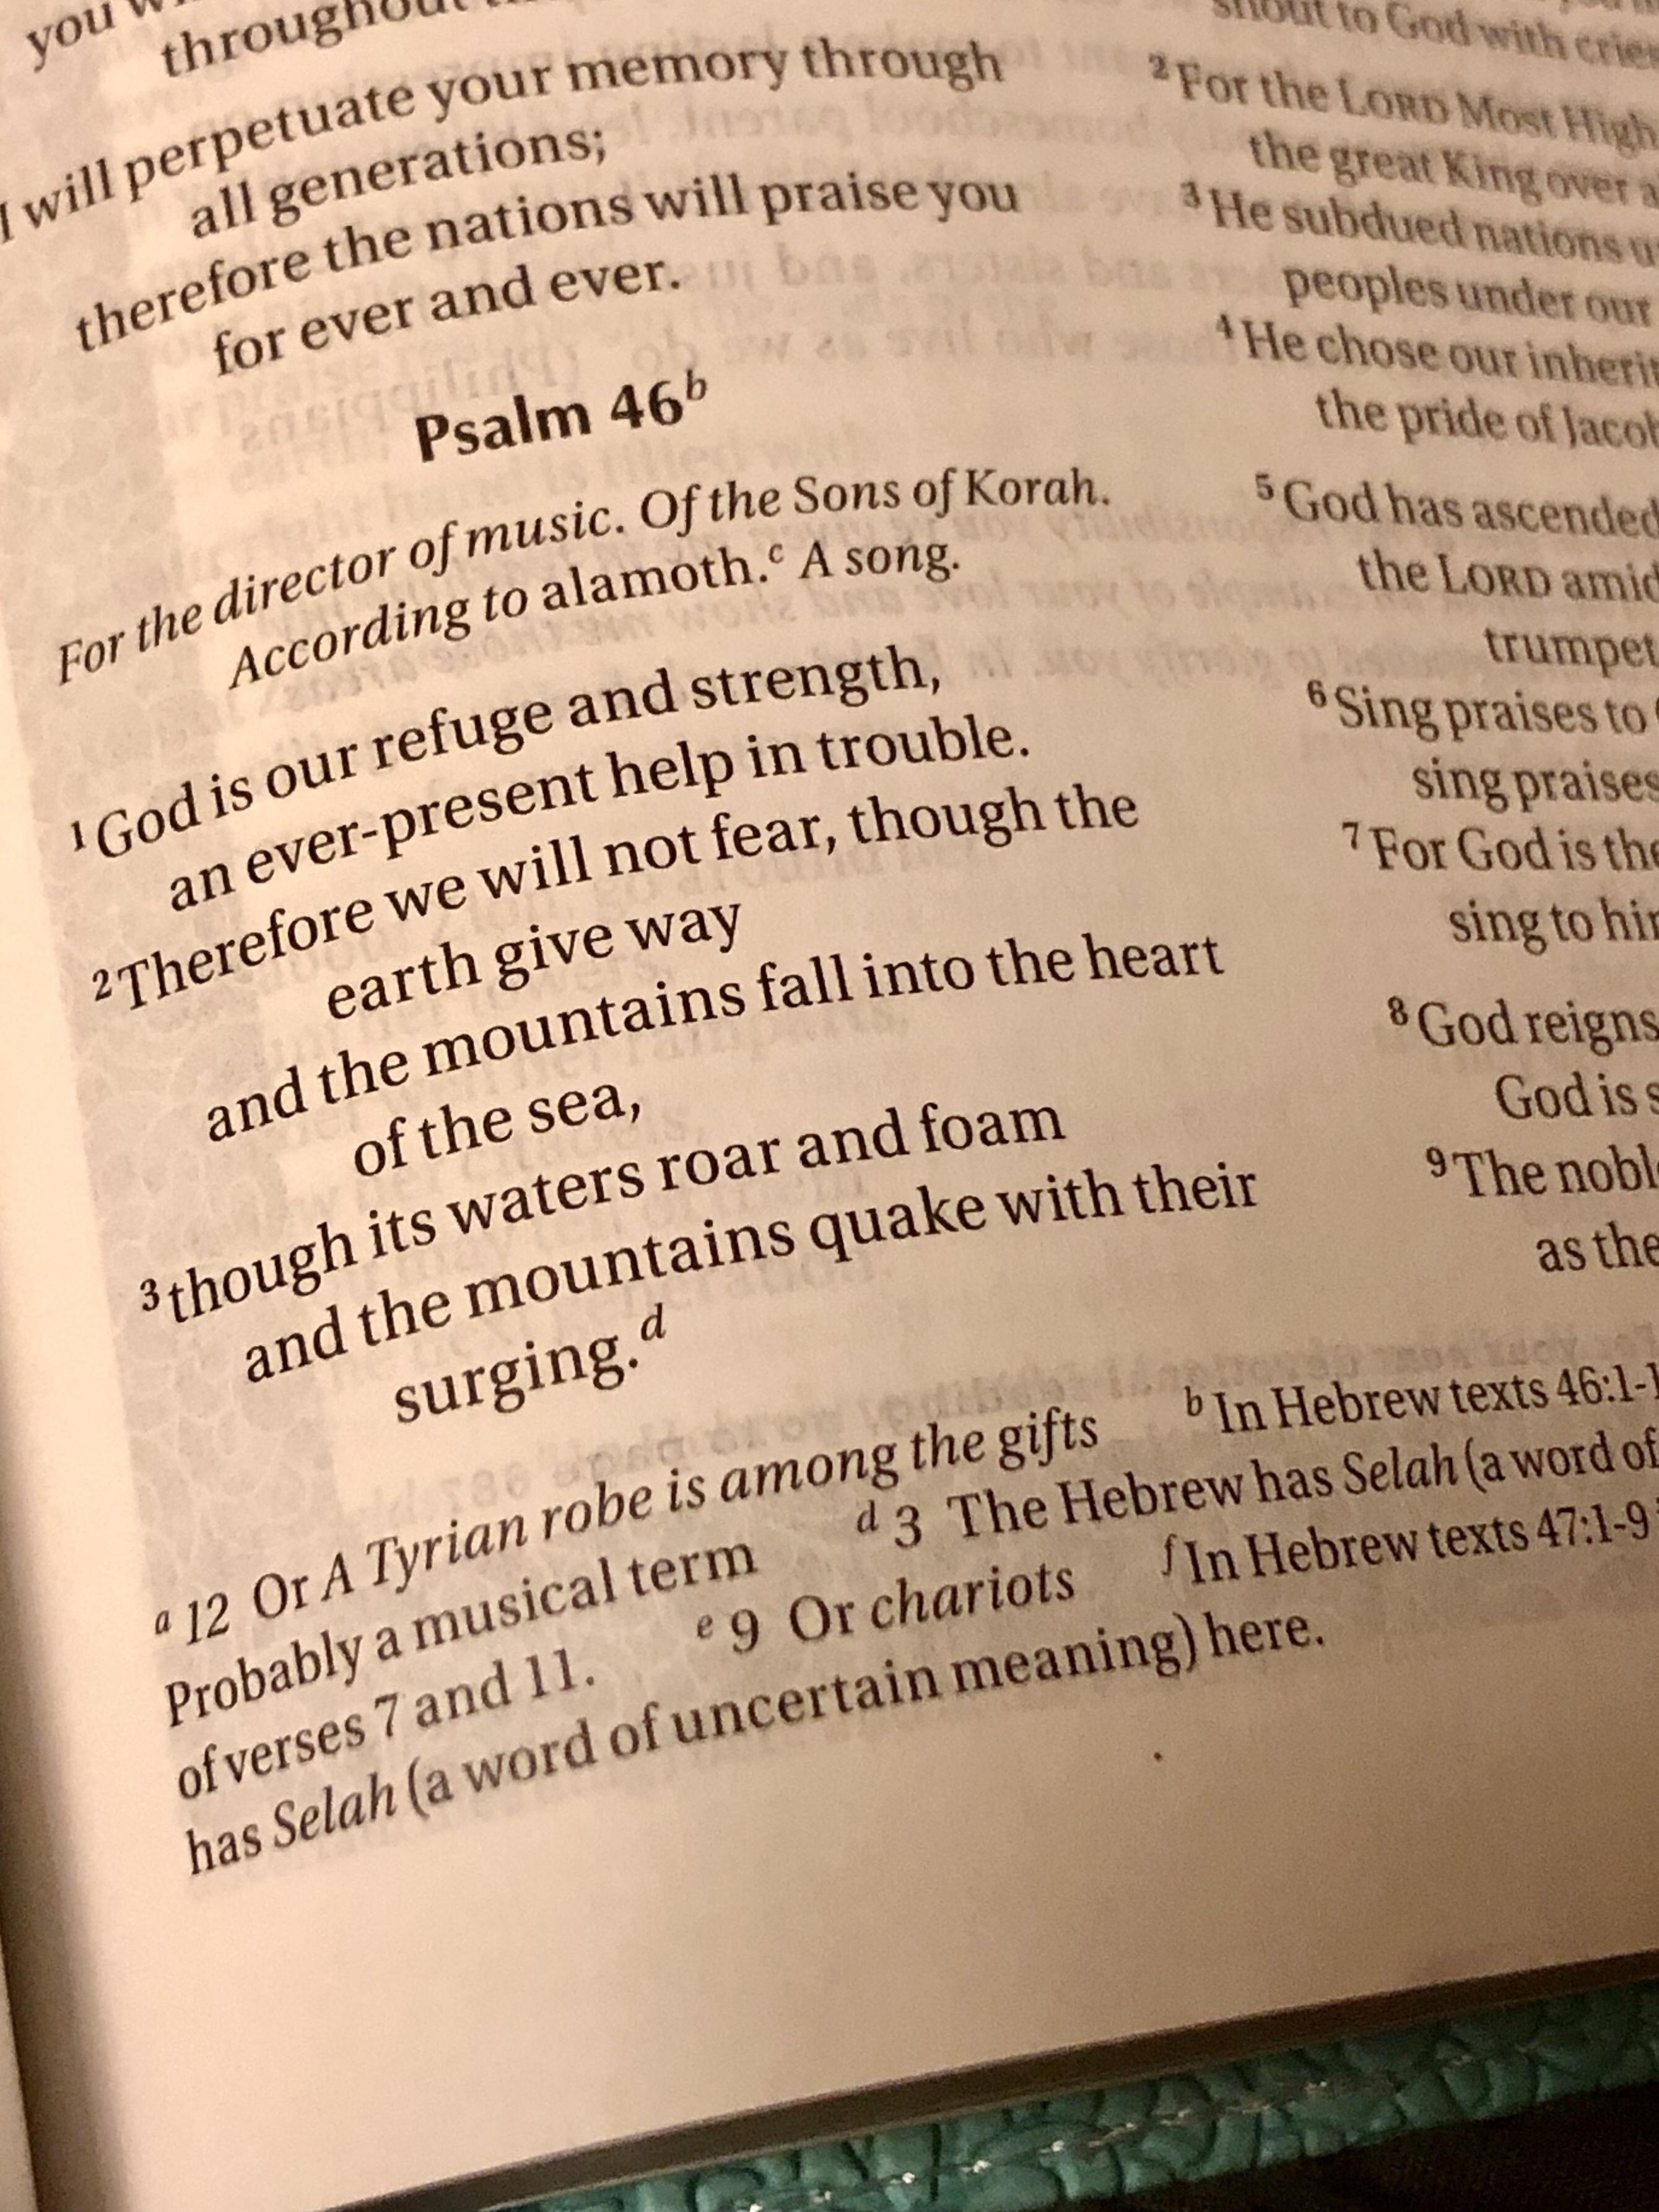 Scripture in a bible Psalm 46